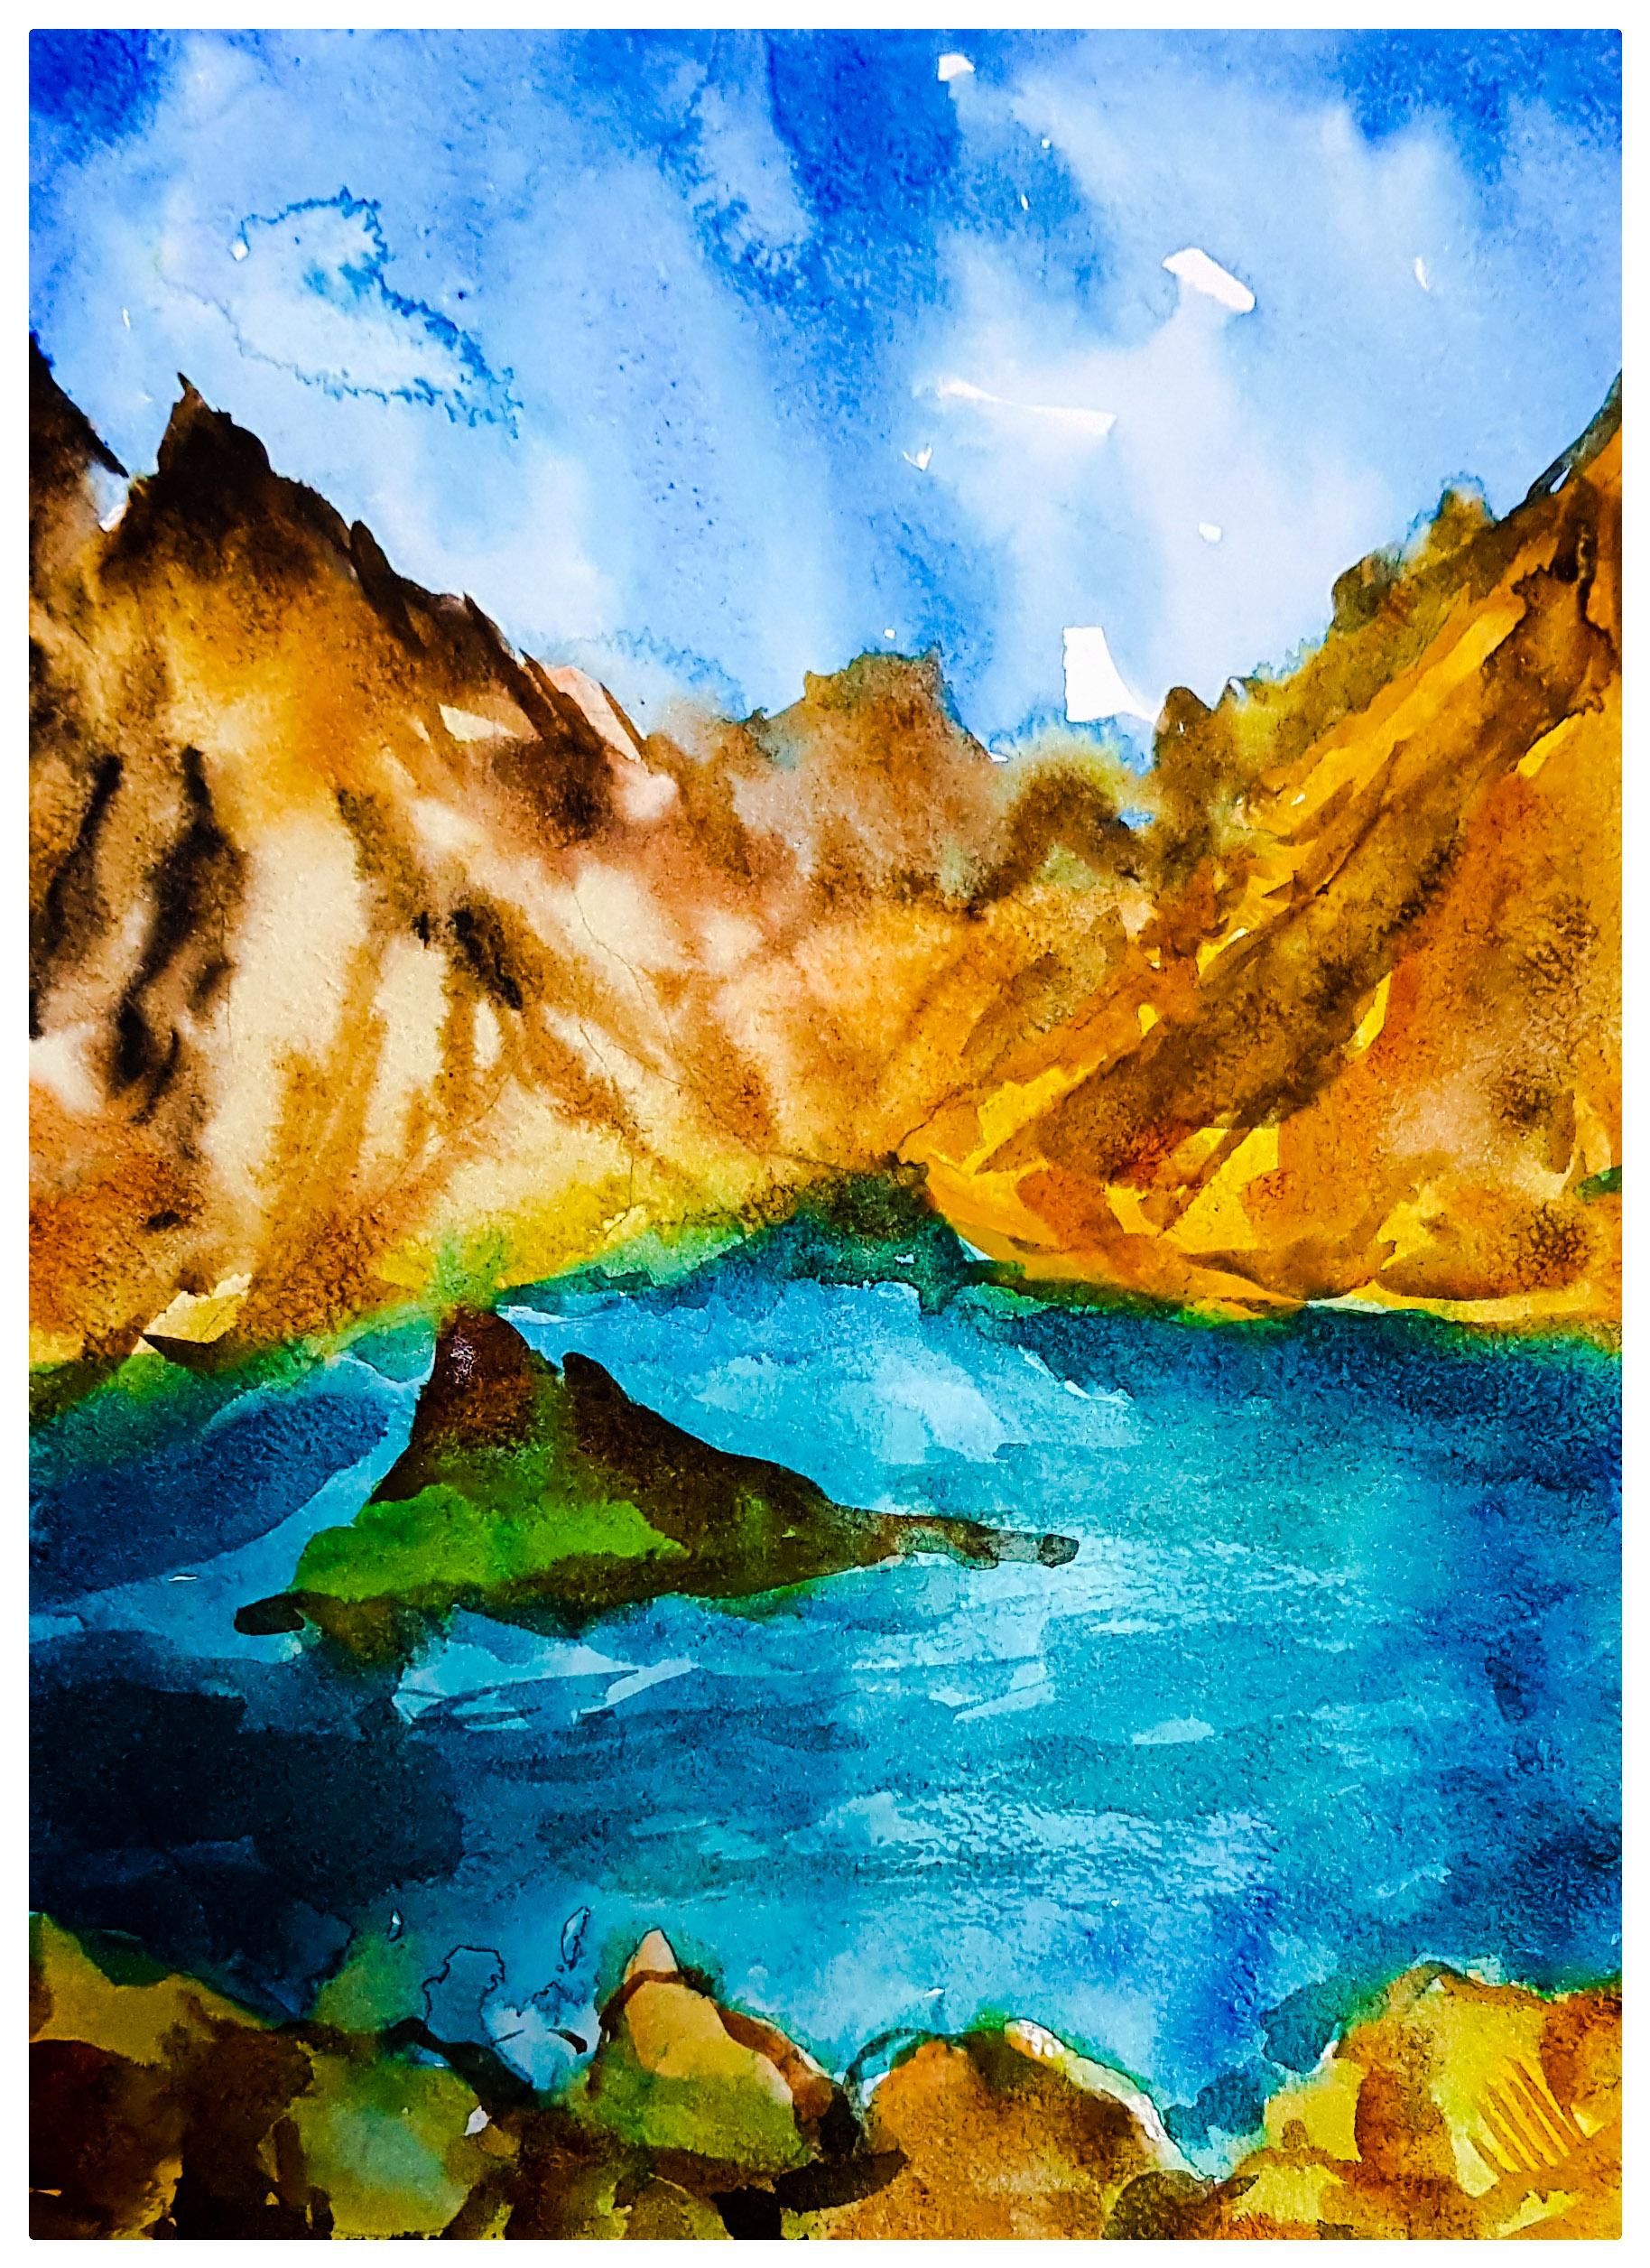 Hatta mountain by Ishita Singh